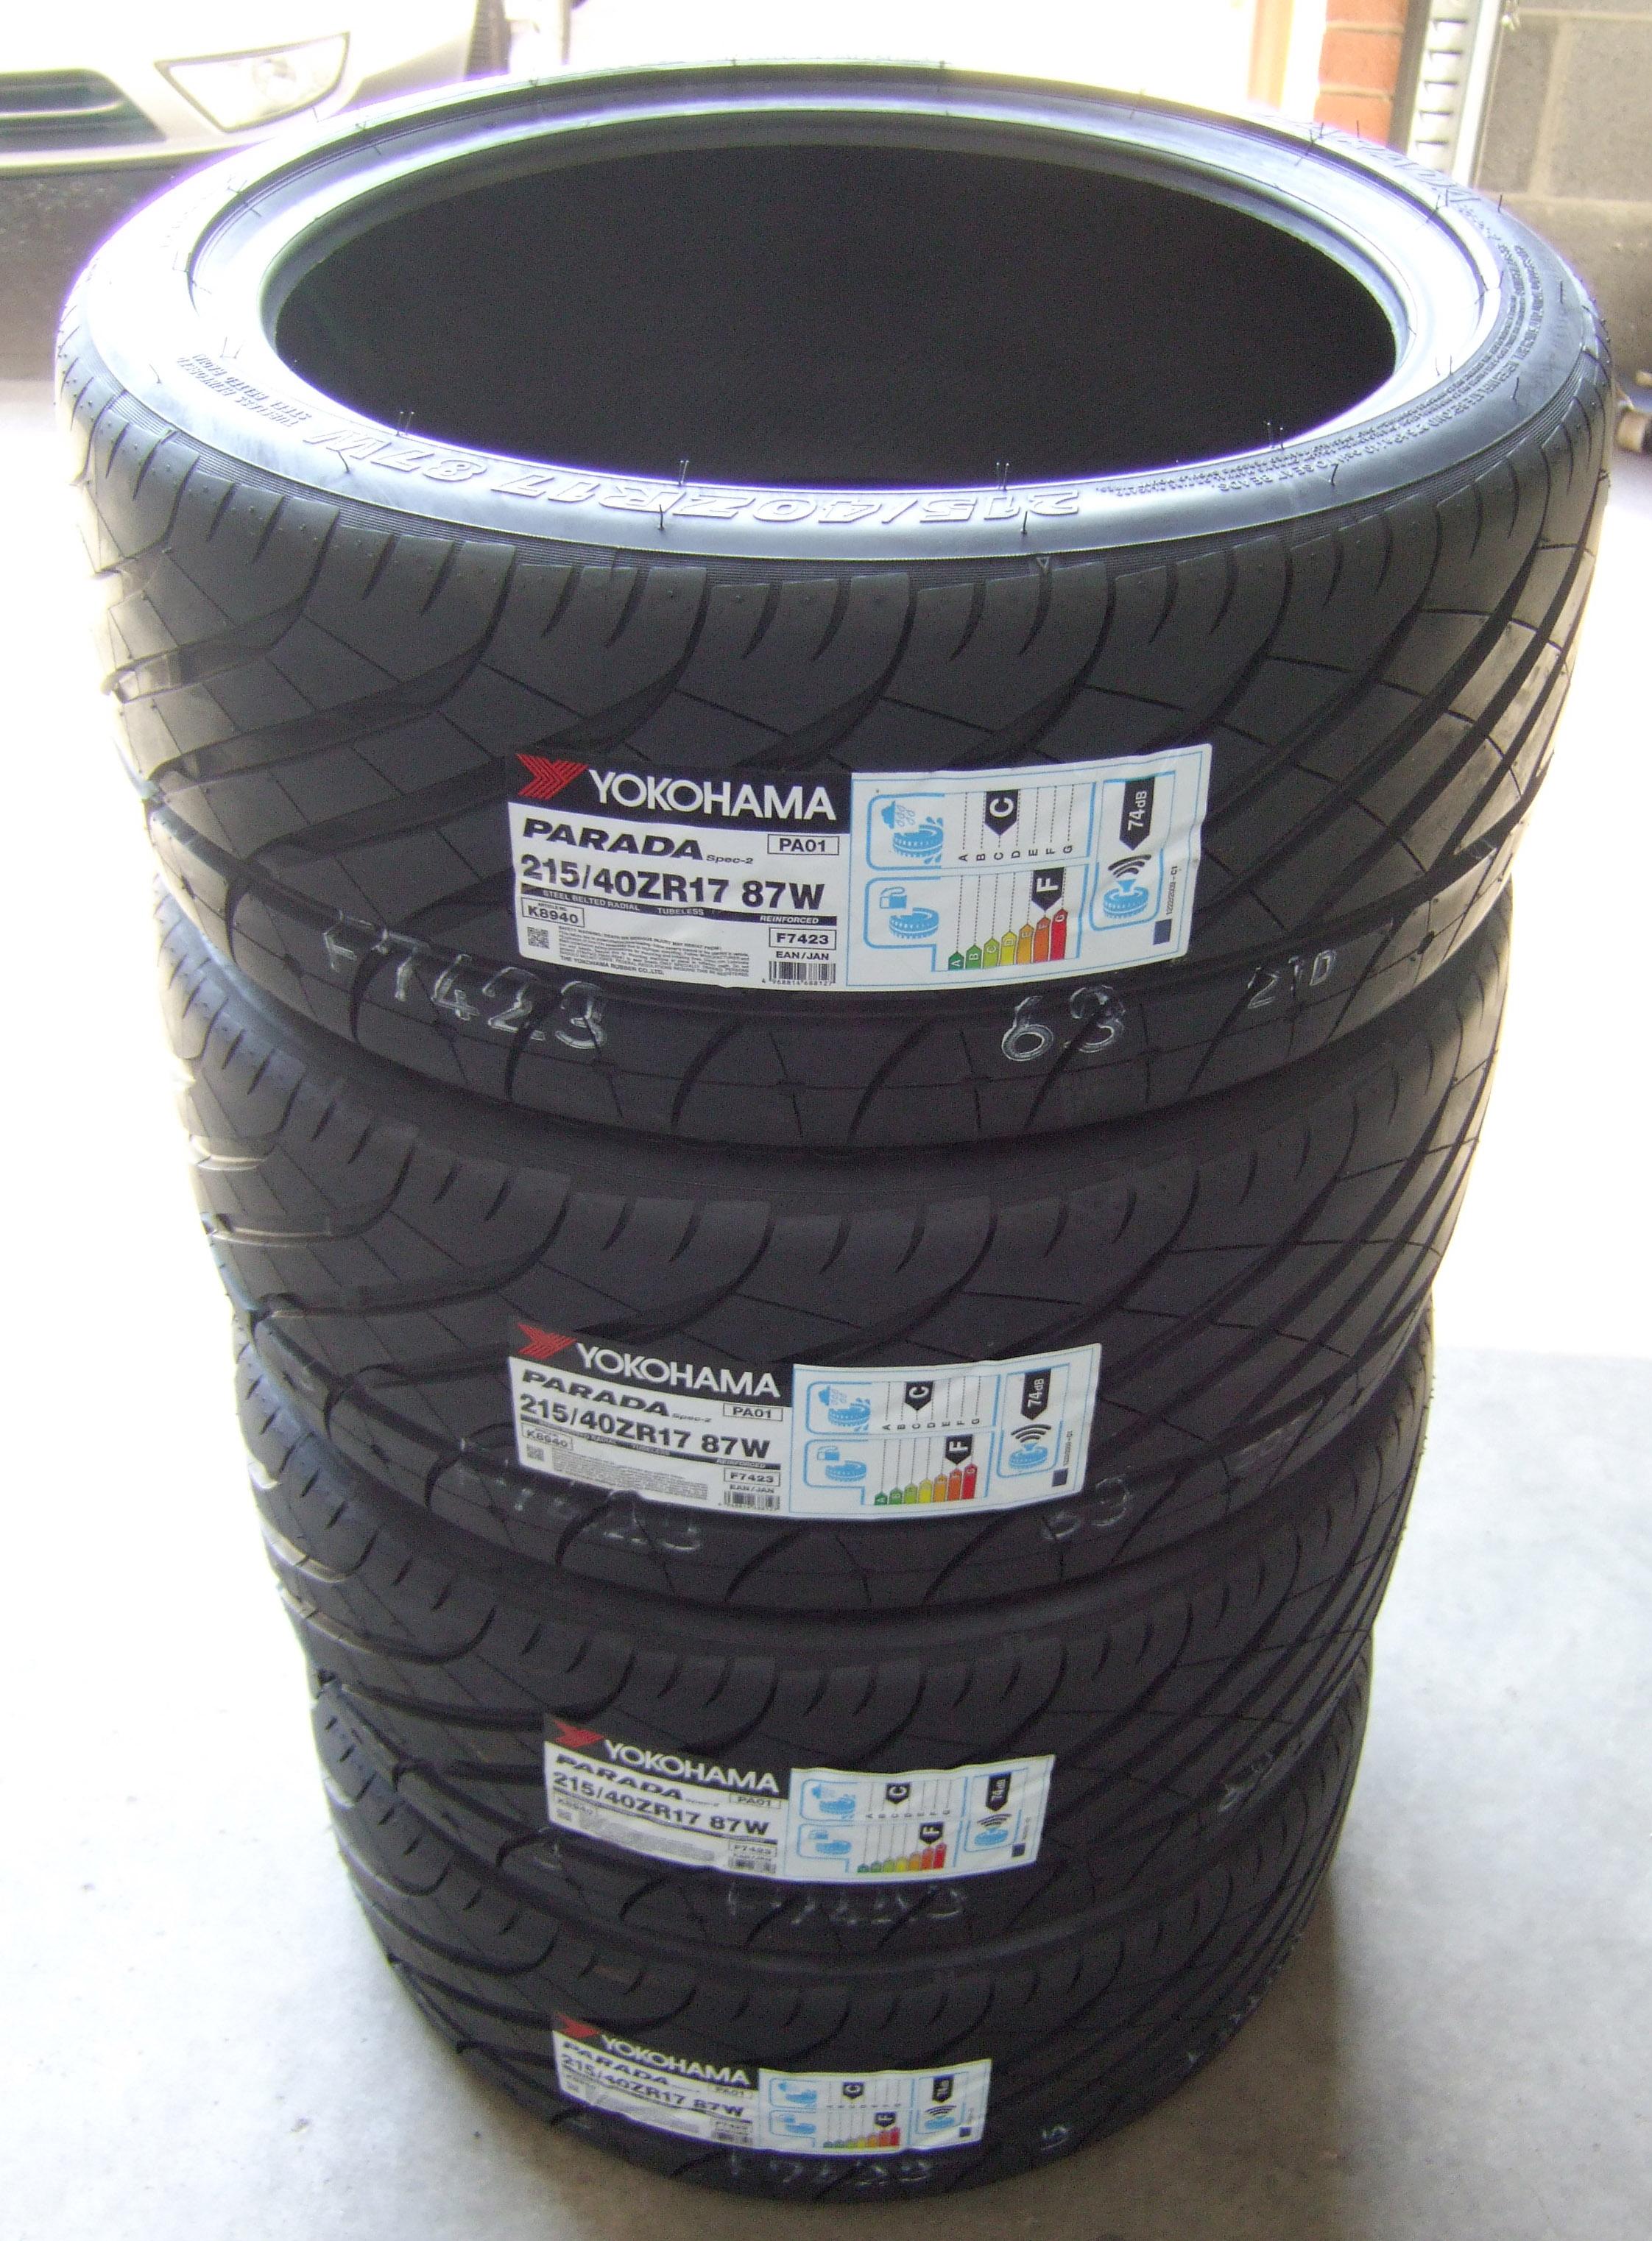 215/40/17 Yokohama Parada Spec 2 Tyres 2154017 87W 215/40 17 - (SET) x4